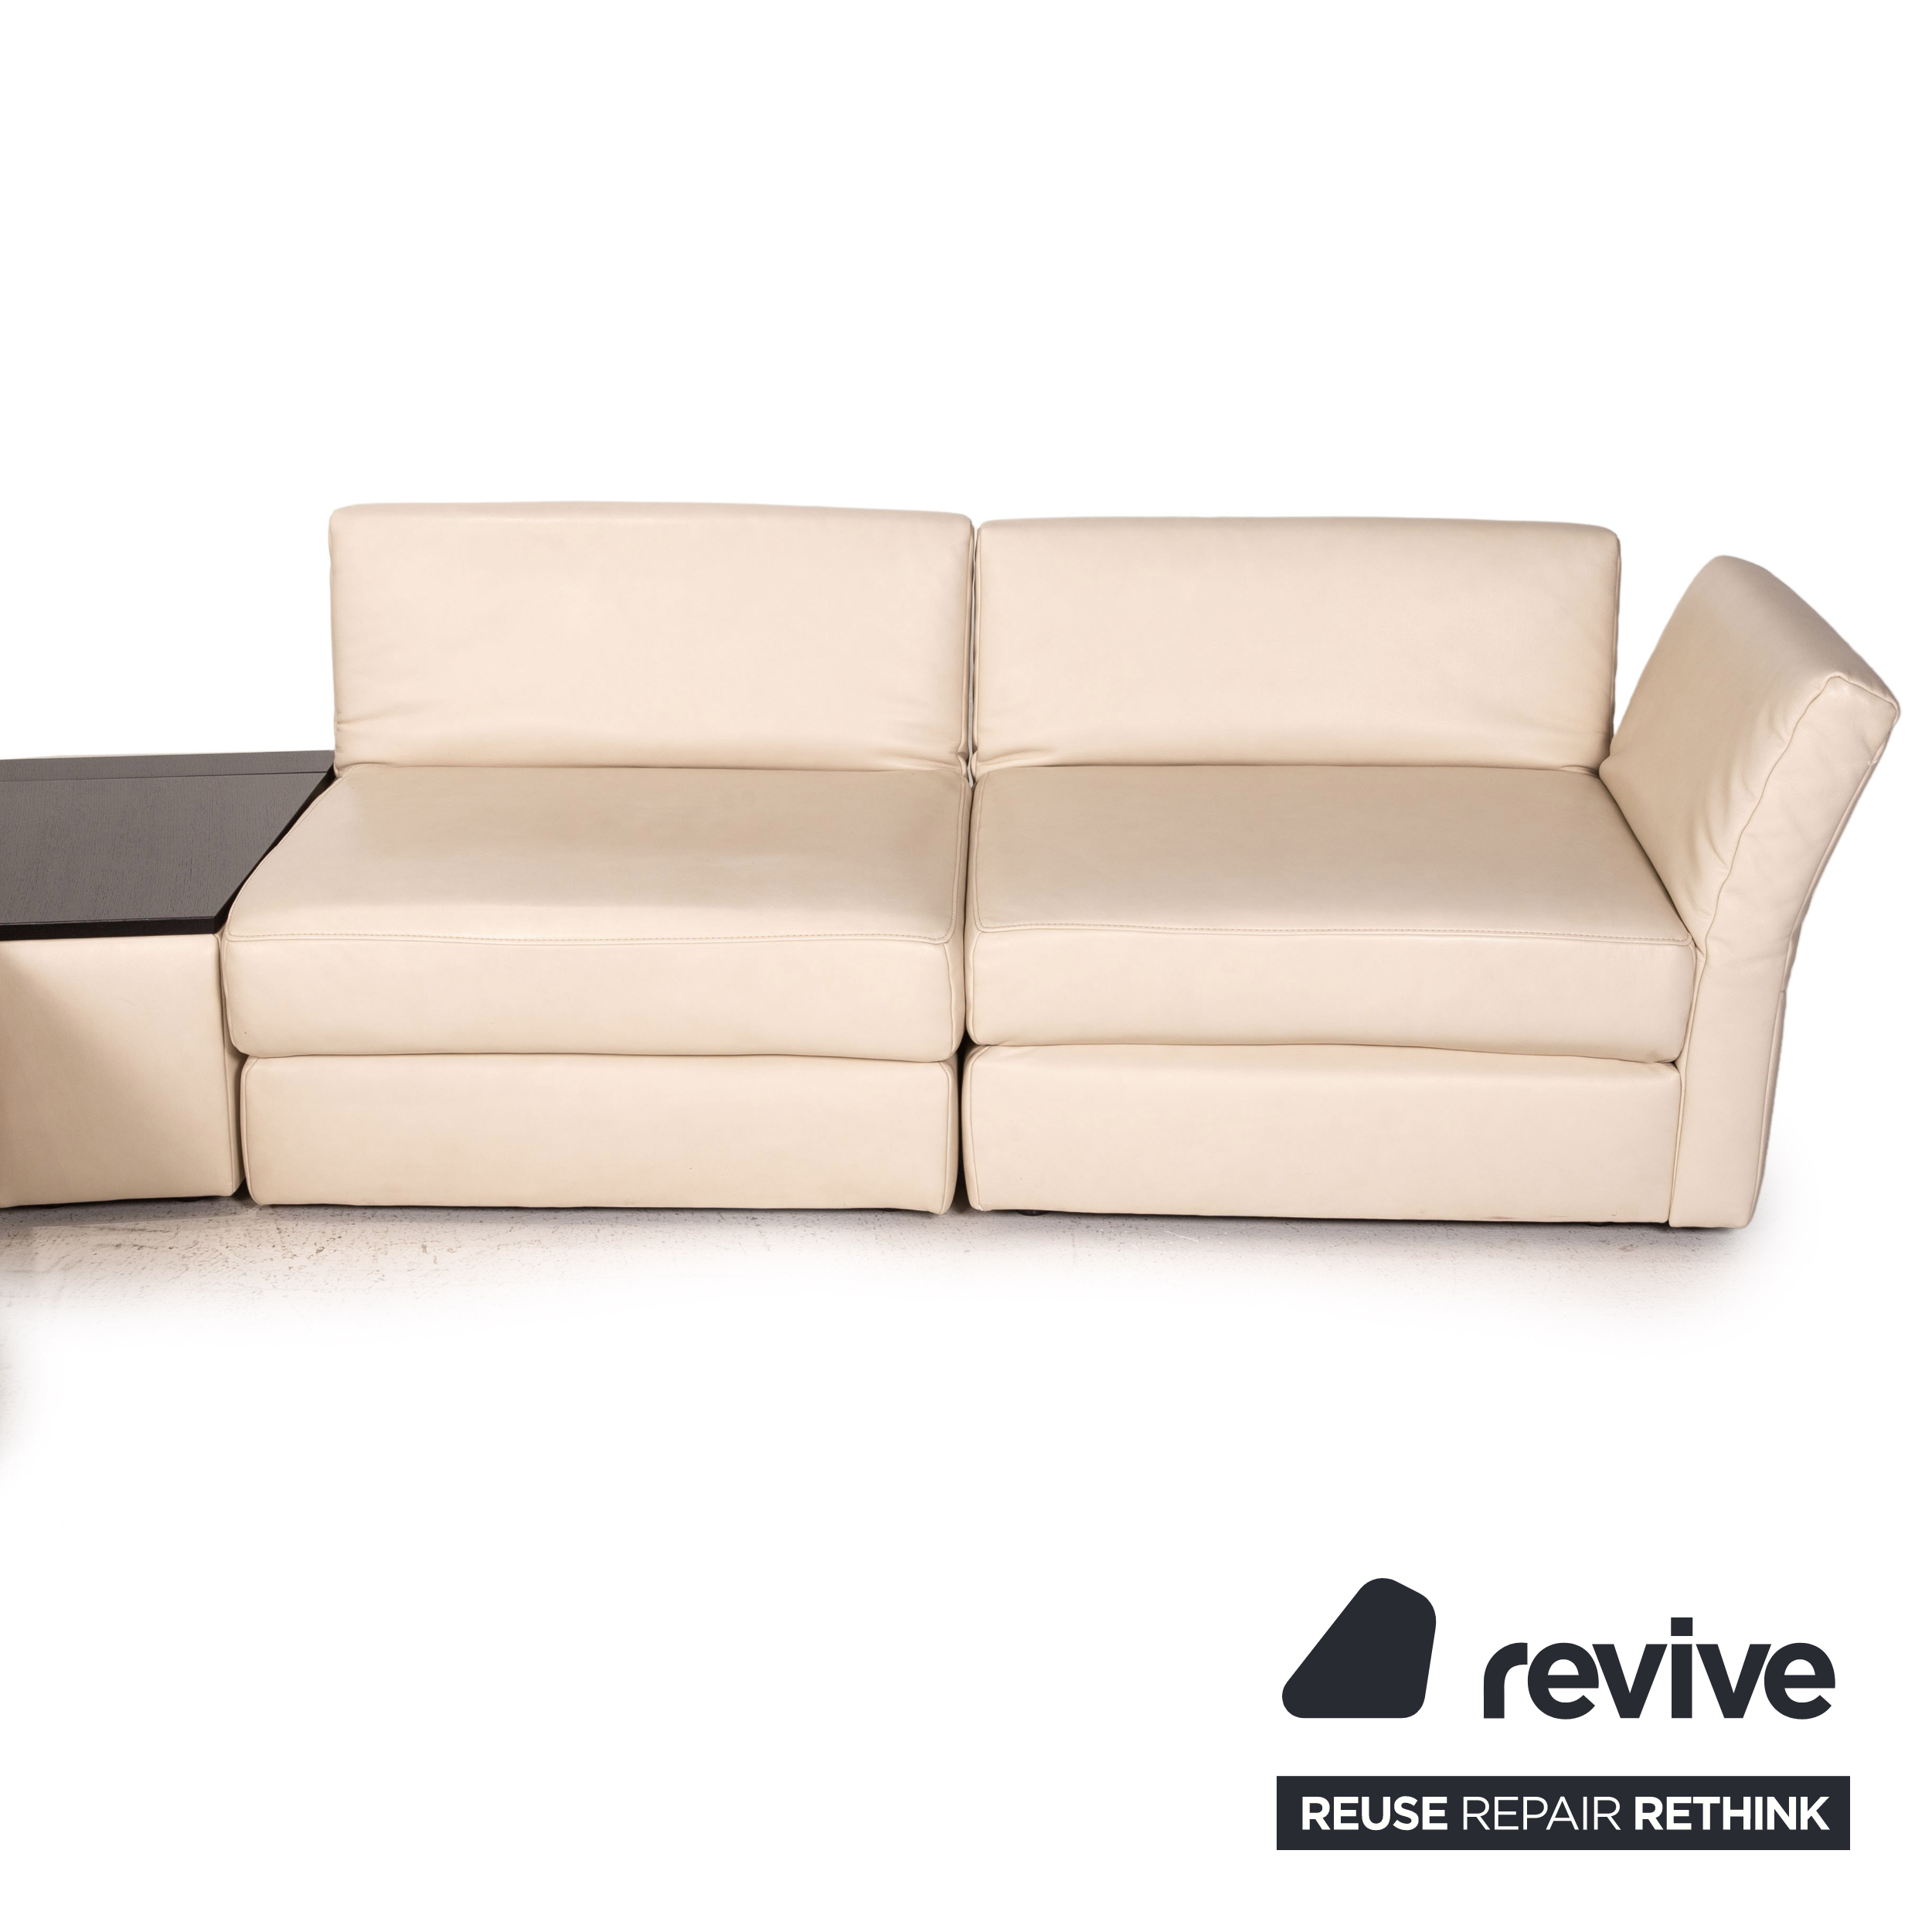 Koinor Avanti Leather Corner Sofa Beige Sofa Couch Function   eBay